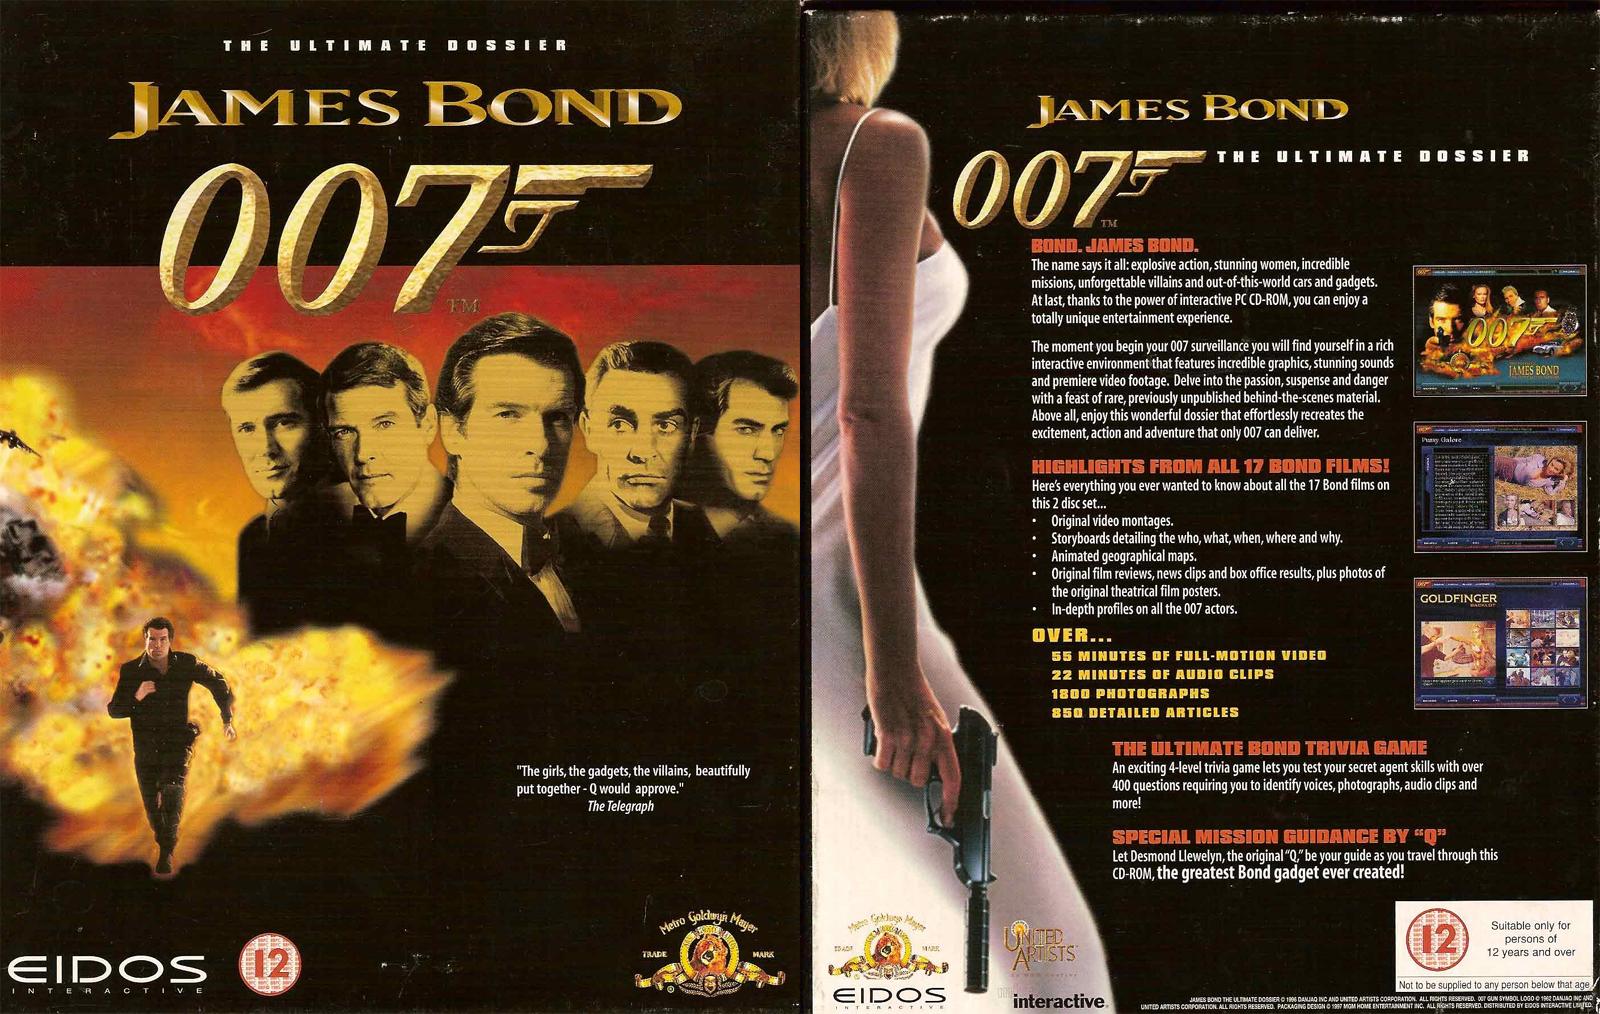 007-dossier-nybro.jpg